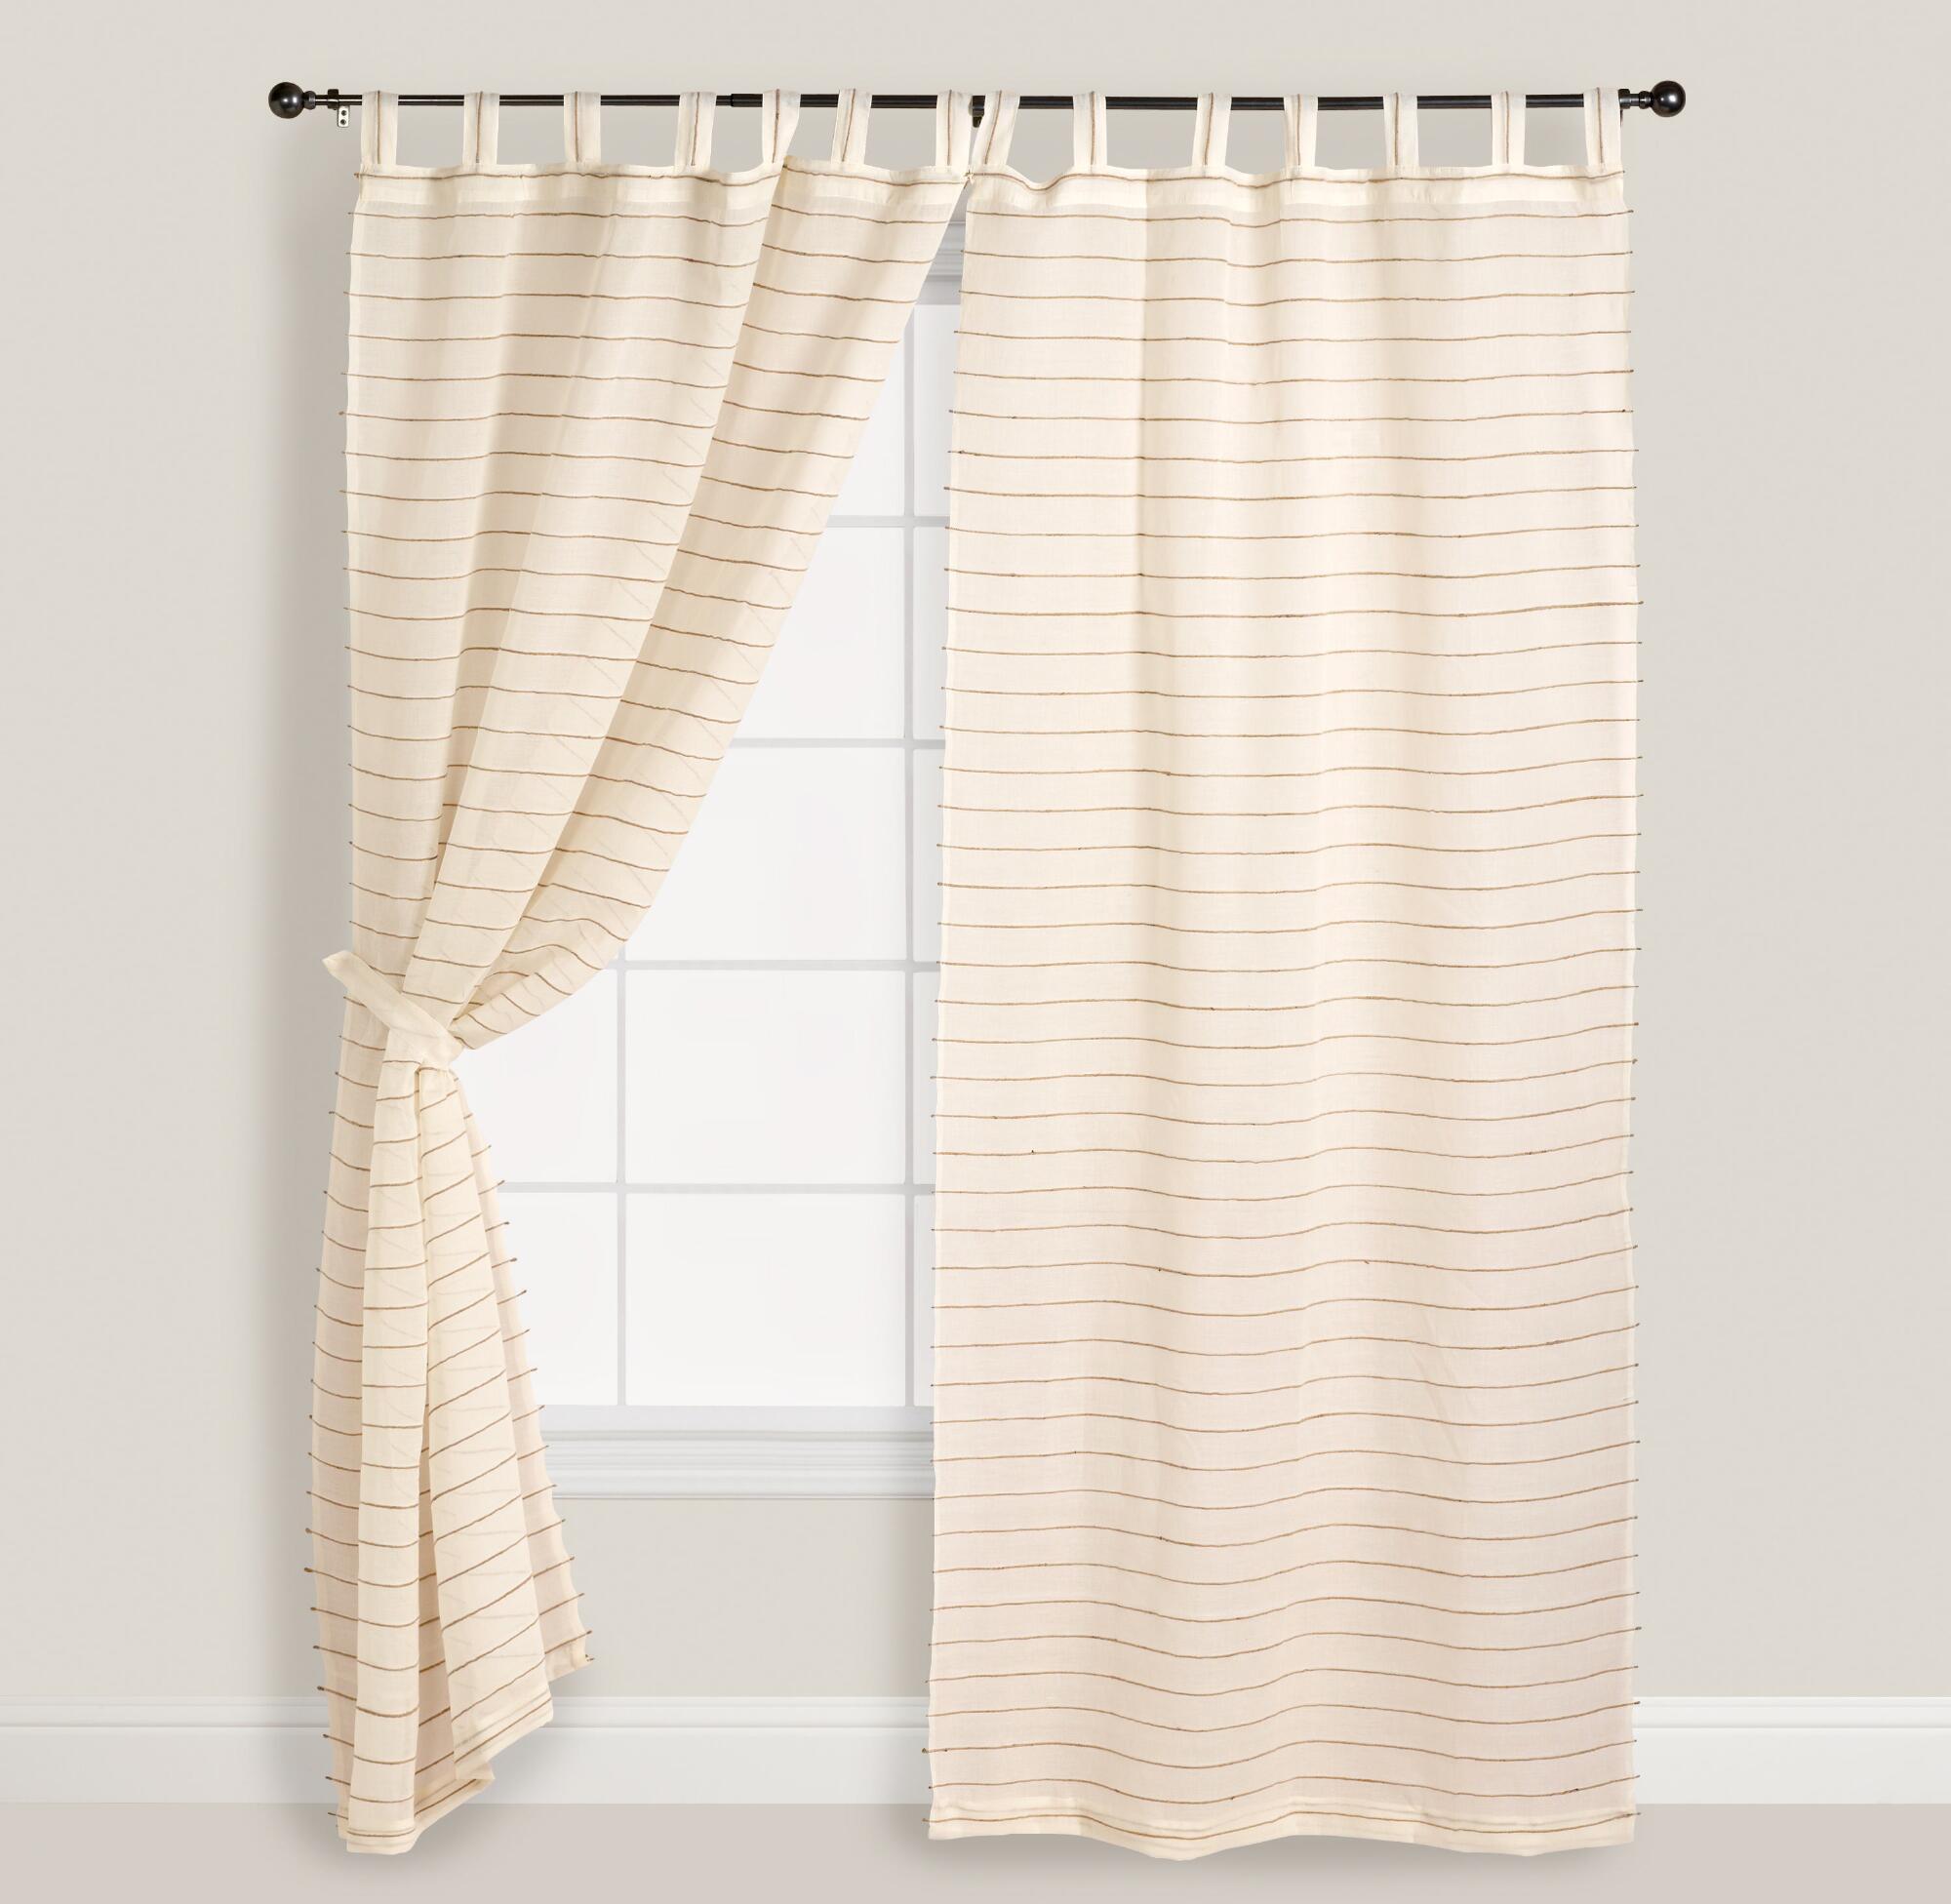 Ivory Striped Sahaj Jute Curtains, Set of 2 | World Market